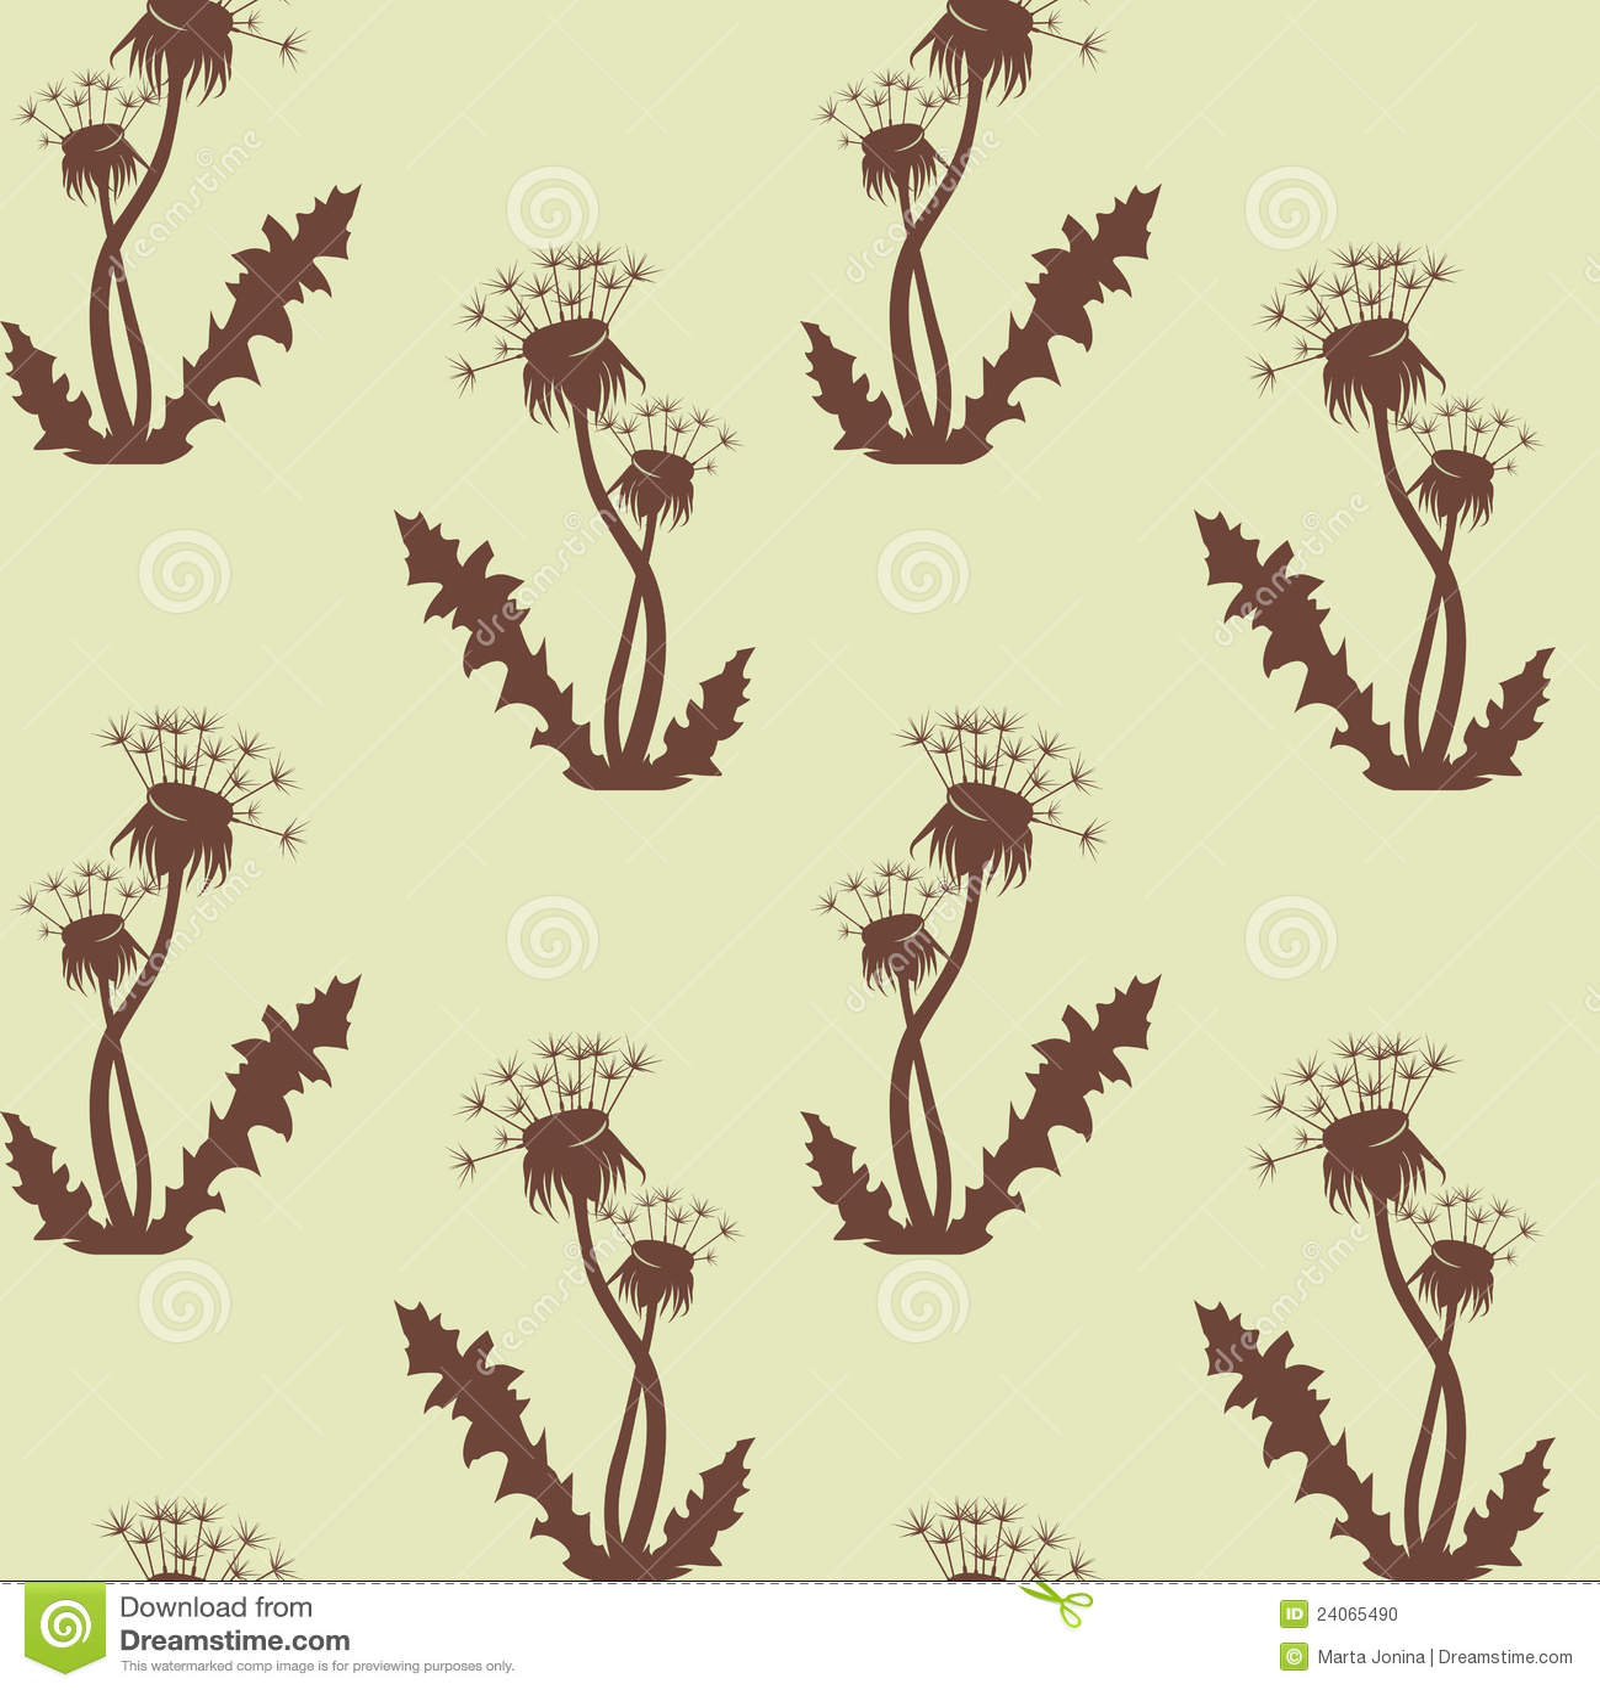 Hd Wallpaper The Gallery For Gt Dandelion Silhouette Black